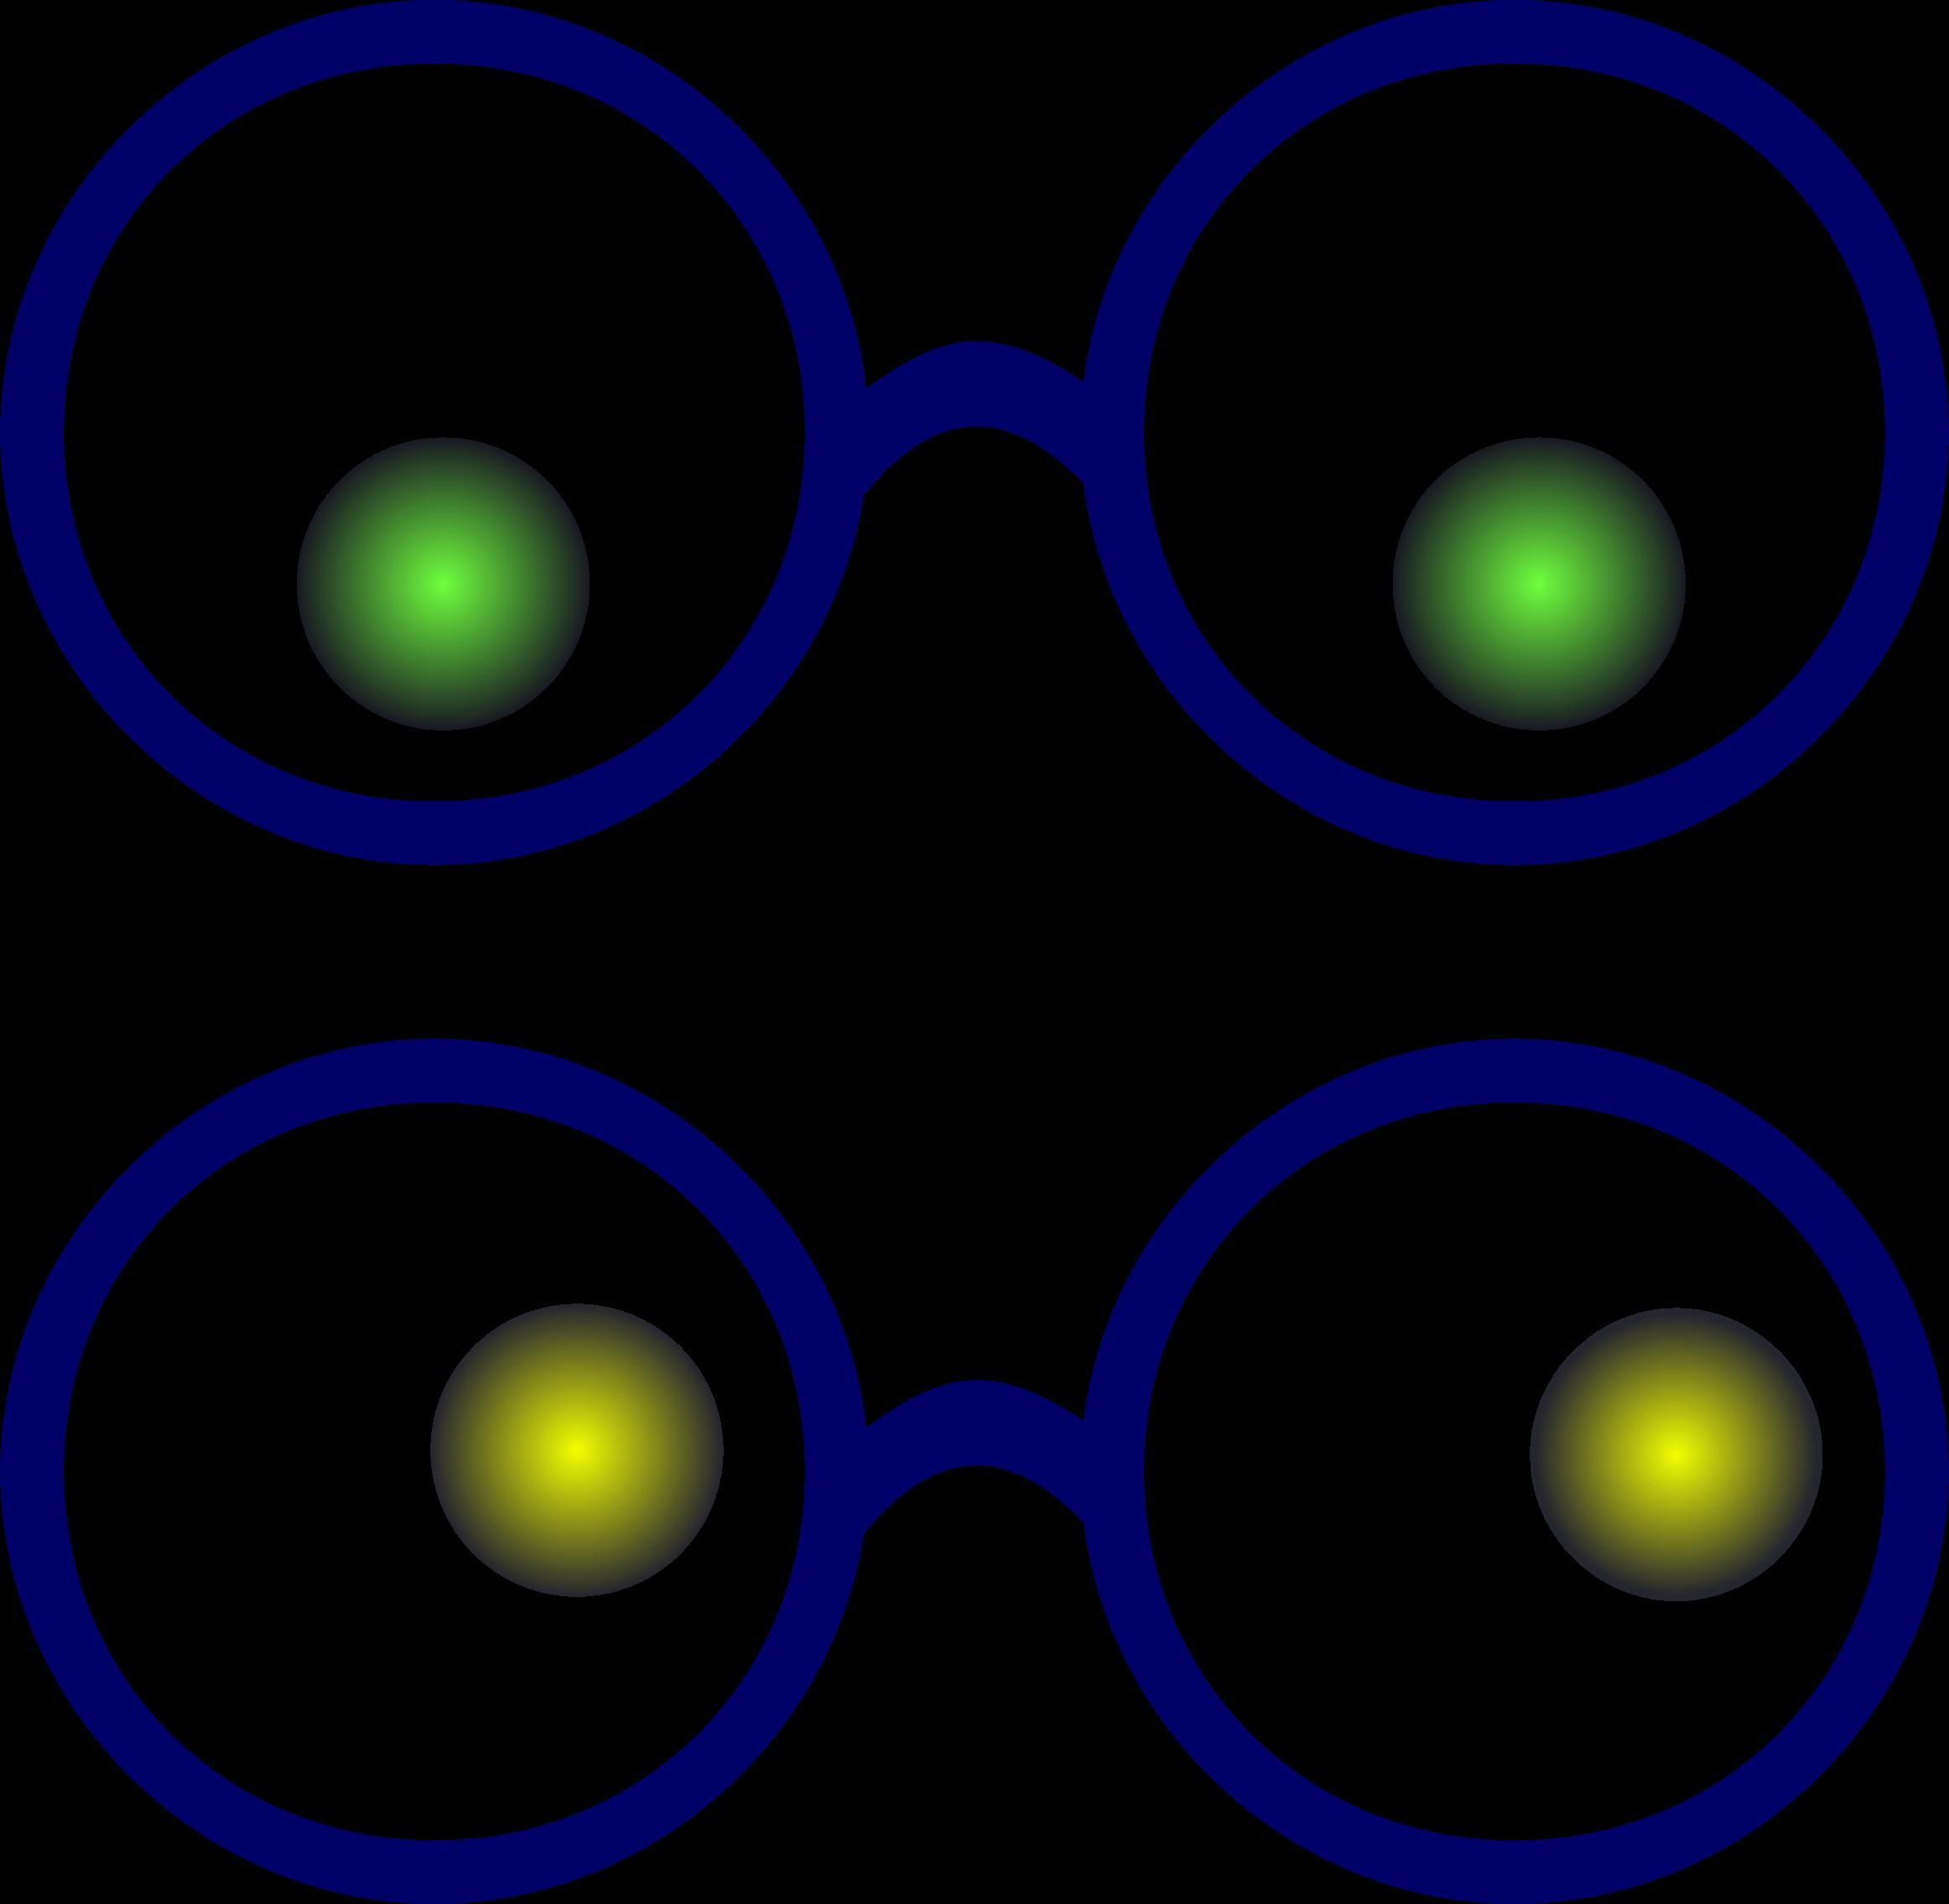 Eyeballs clipart eye optical. Simple eyes with glasses